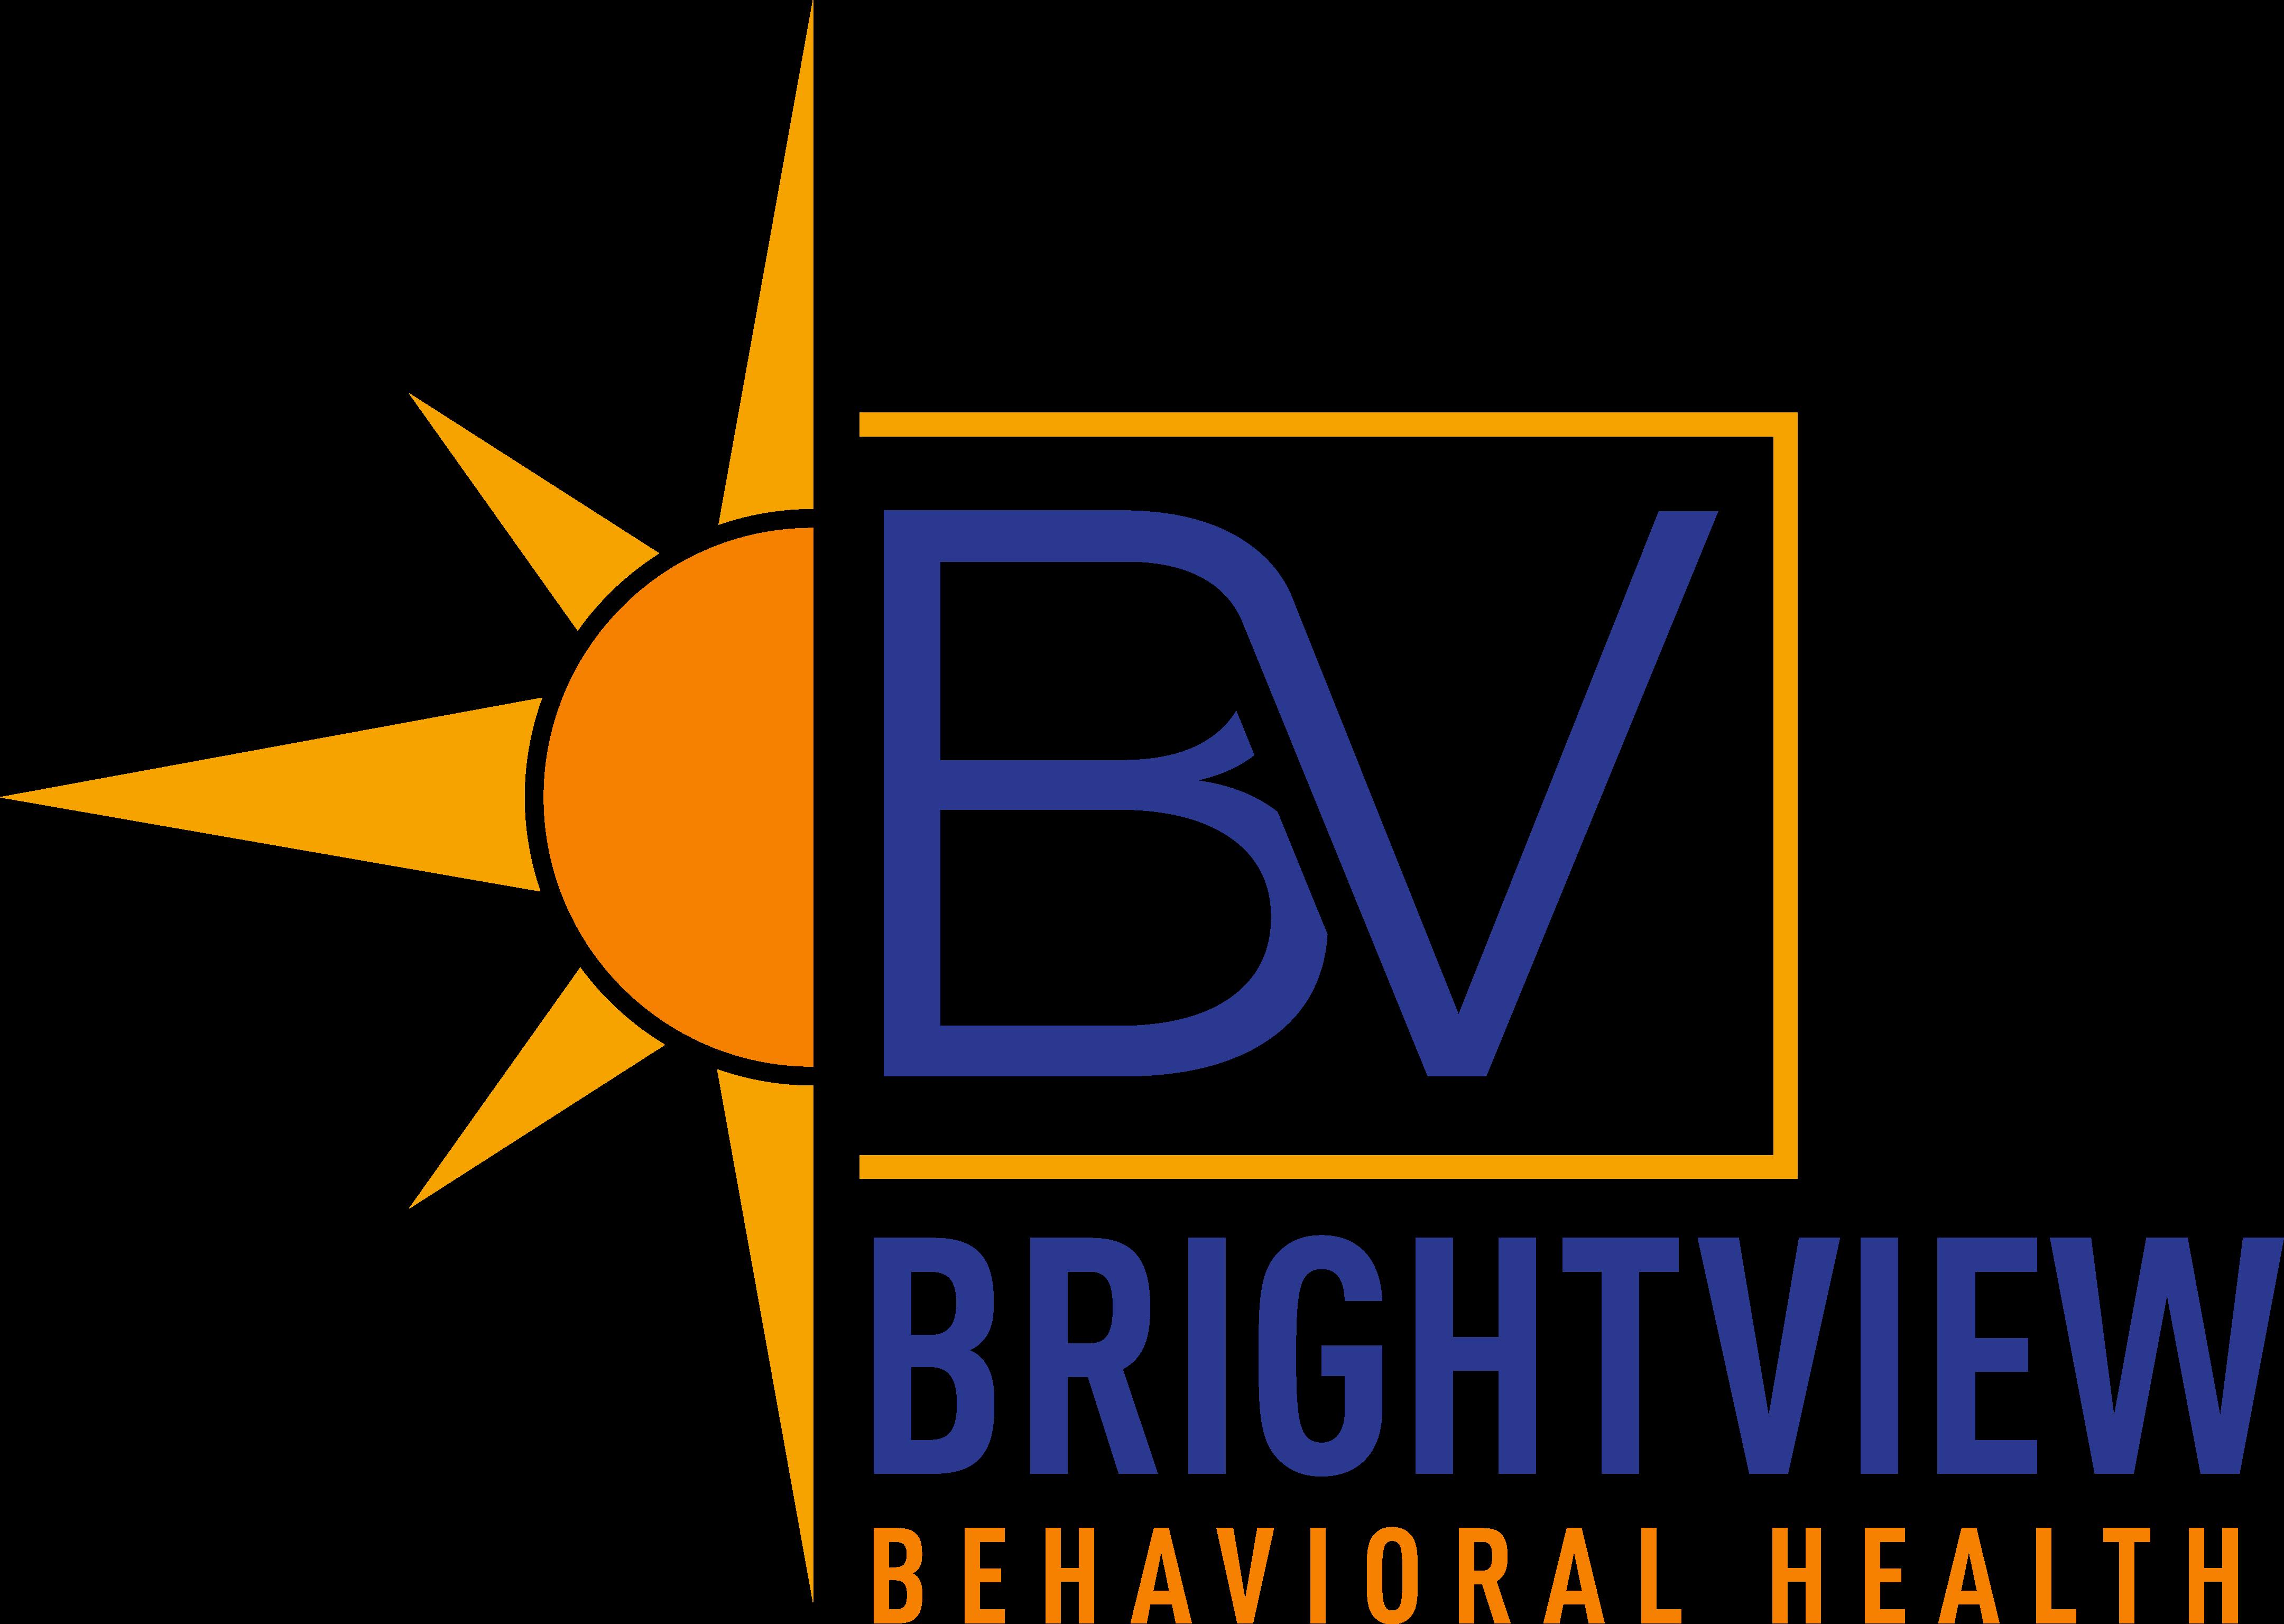 BrightView Behavioral Health logo